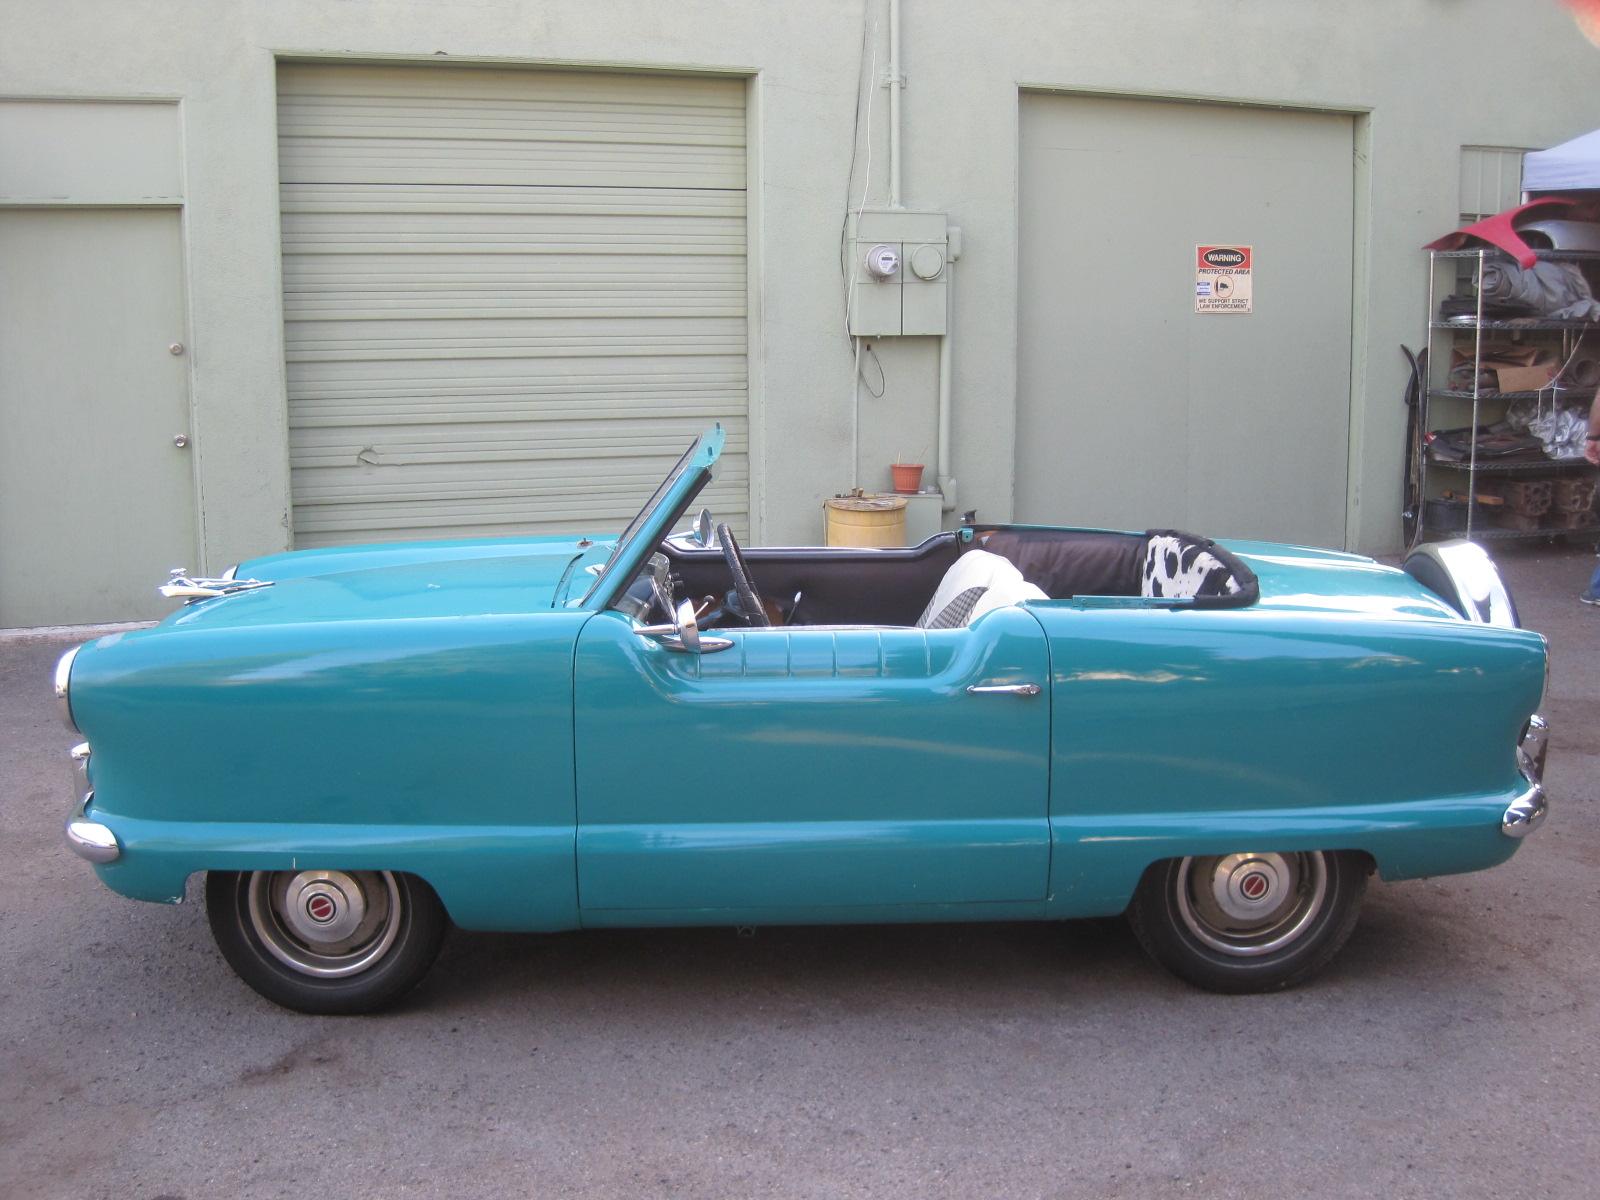 1962 nash metropolitan for sale phil newey sports cars V8 Nash Metropolitan img 1152